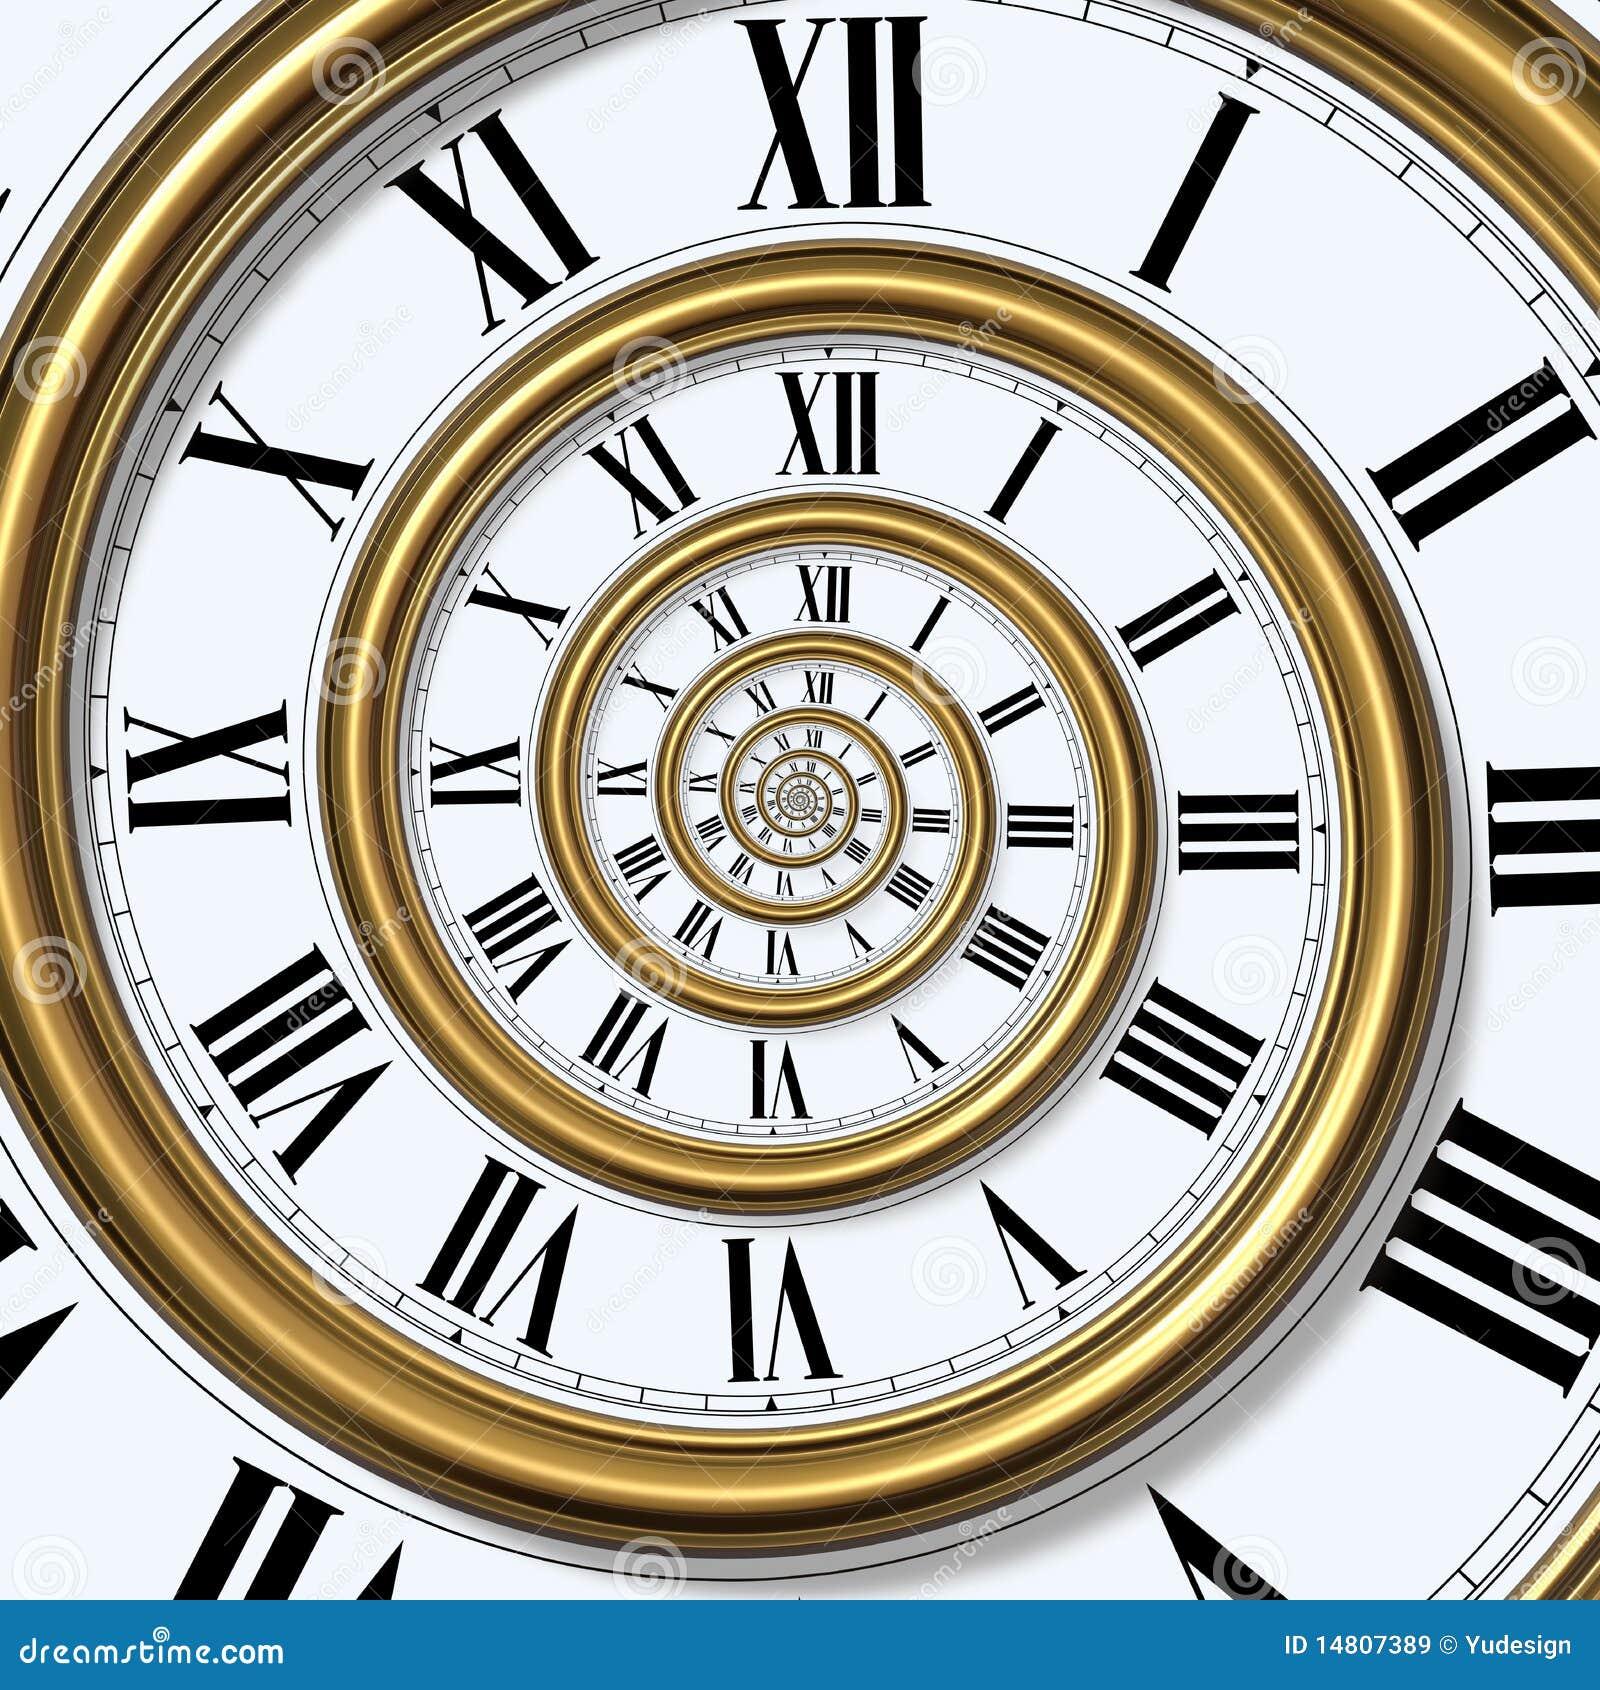 Time Travel Spiral